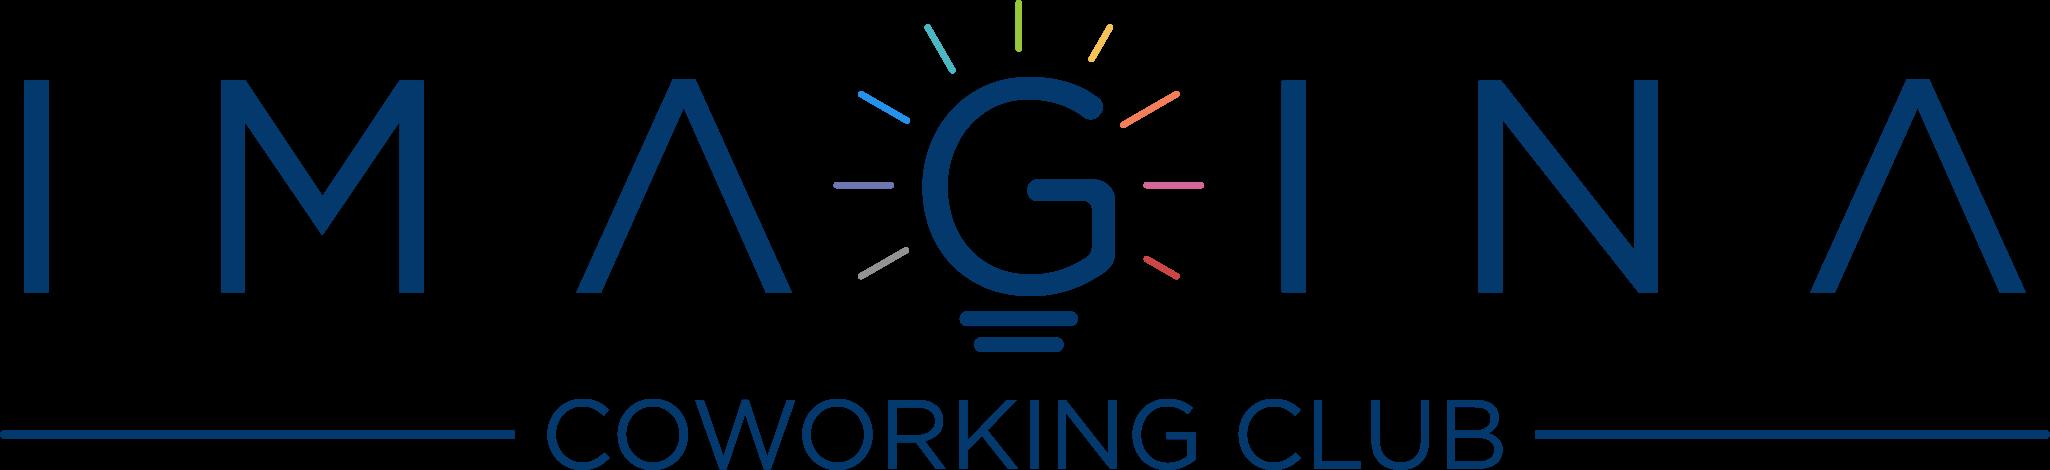 Logotipo de Imagina Coworking Club